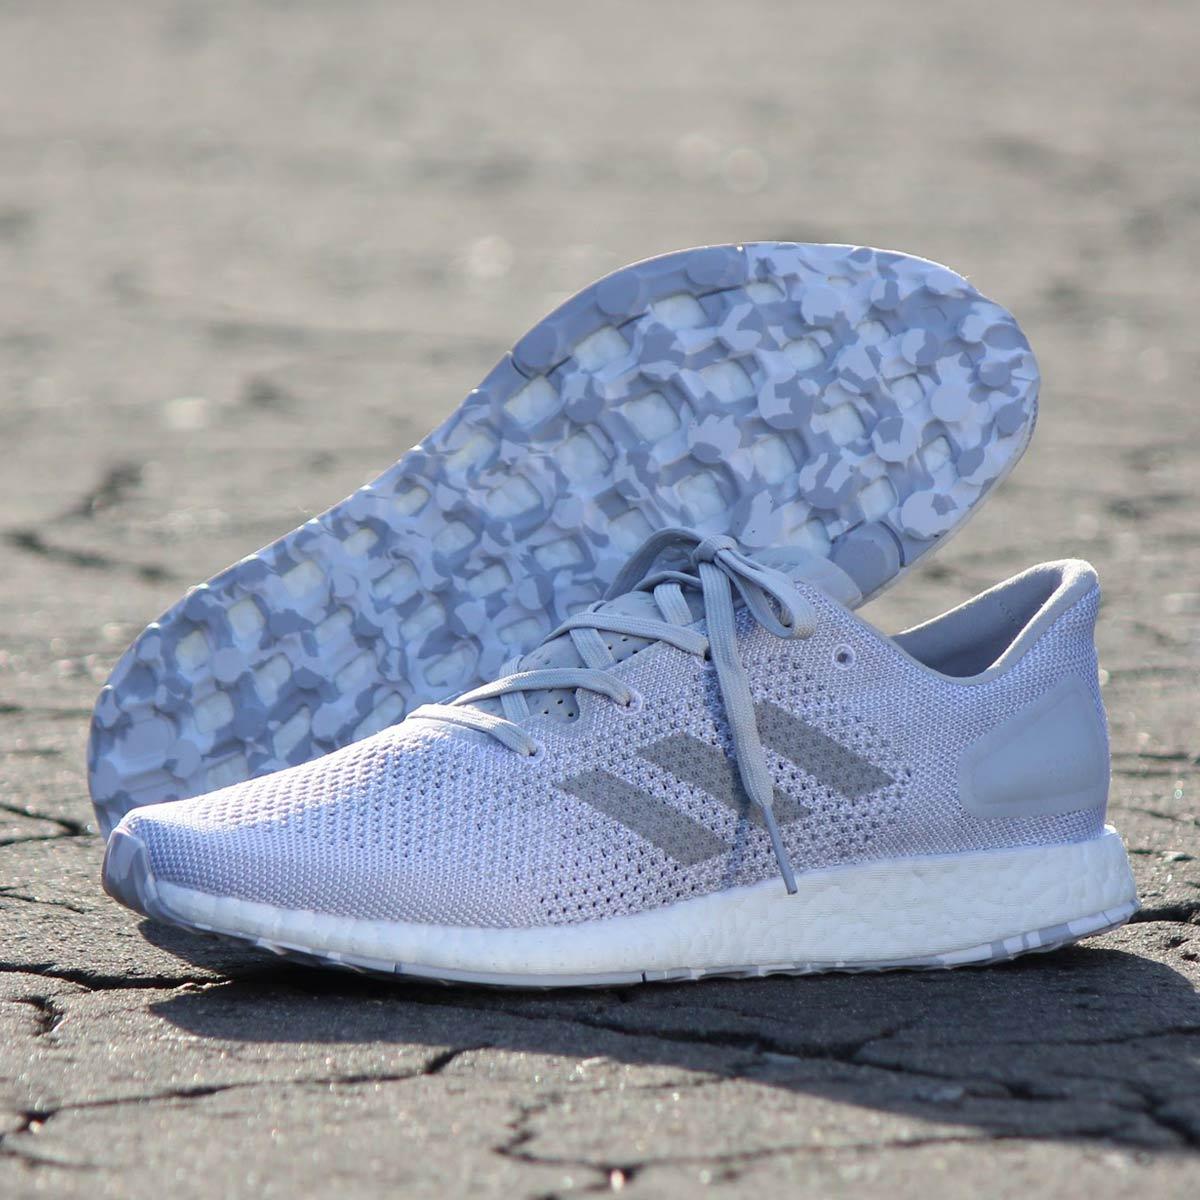 adidas Originals PureBOOST DPR LTD (アディダス ピュアブースト DPR LTD)Running White/Mid Grey/Solid Grey【メンズ スニーカー】17FW-S